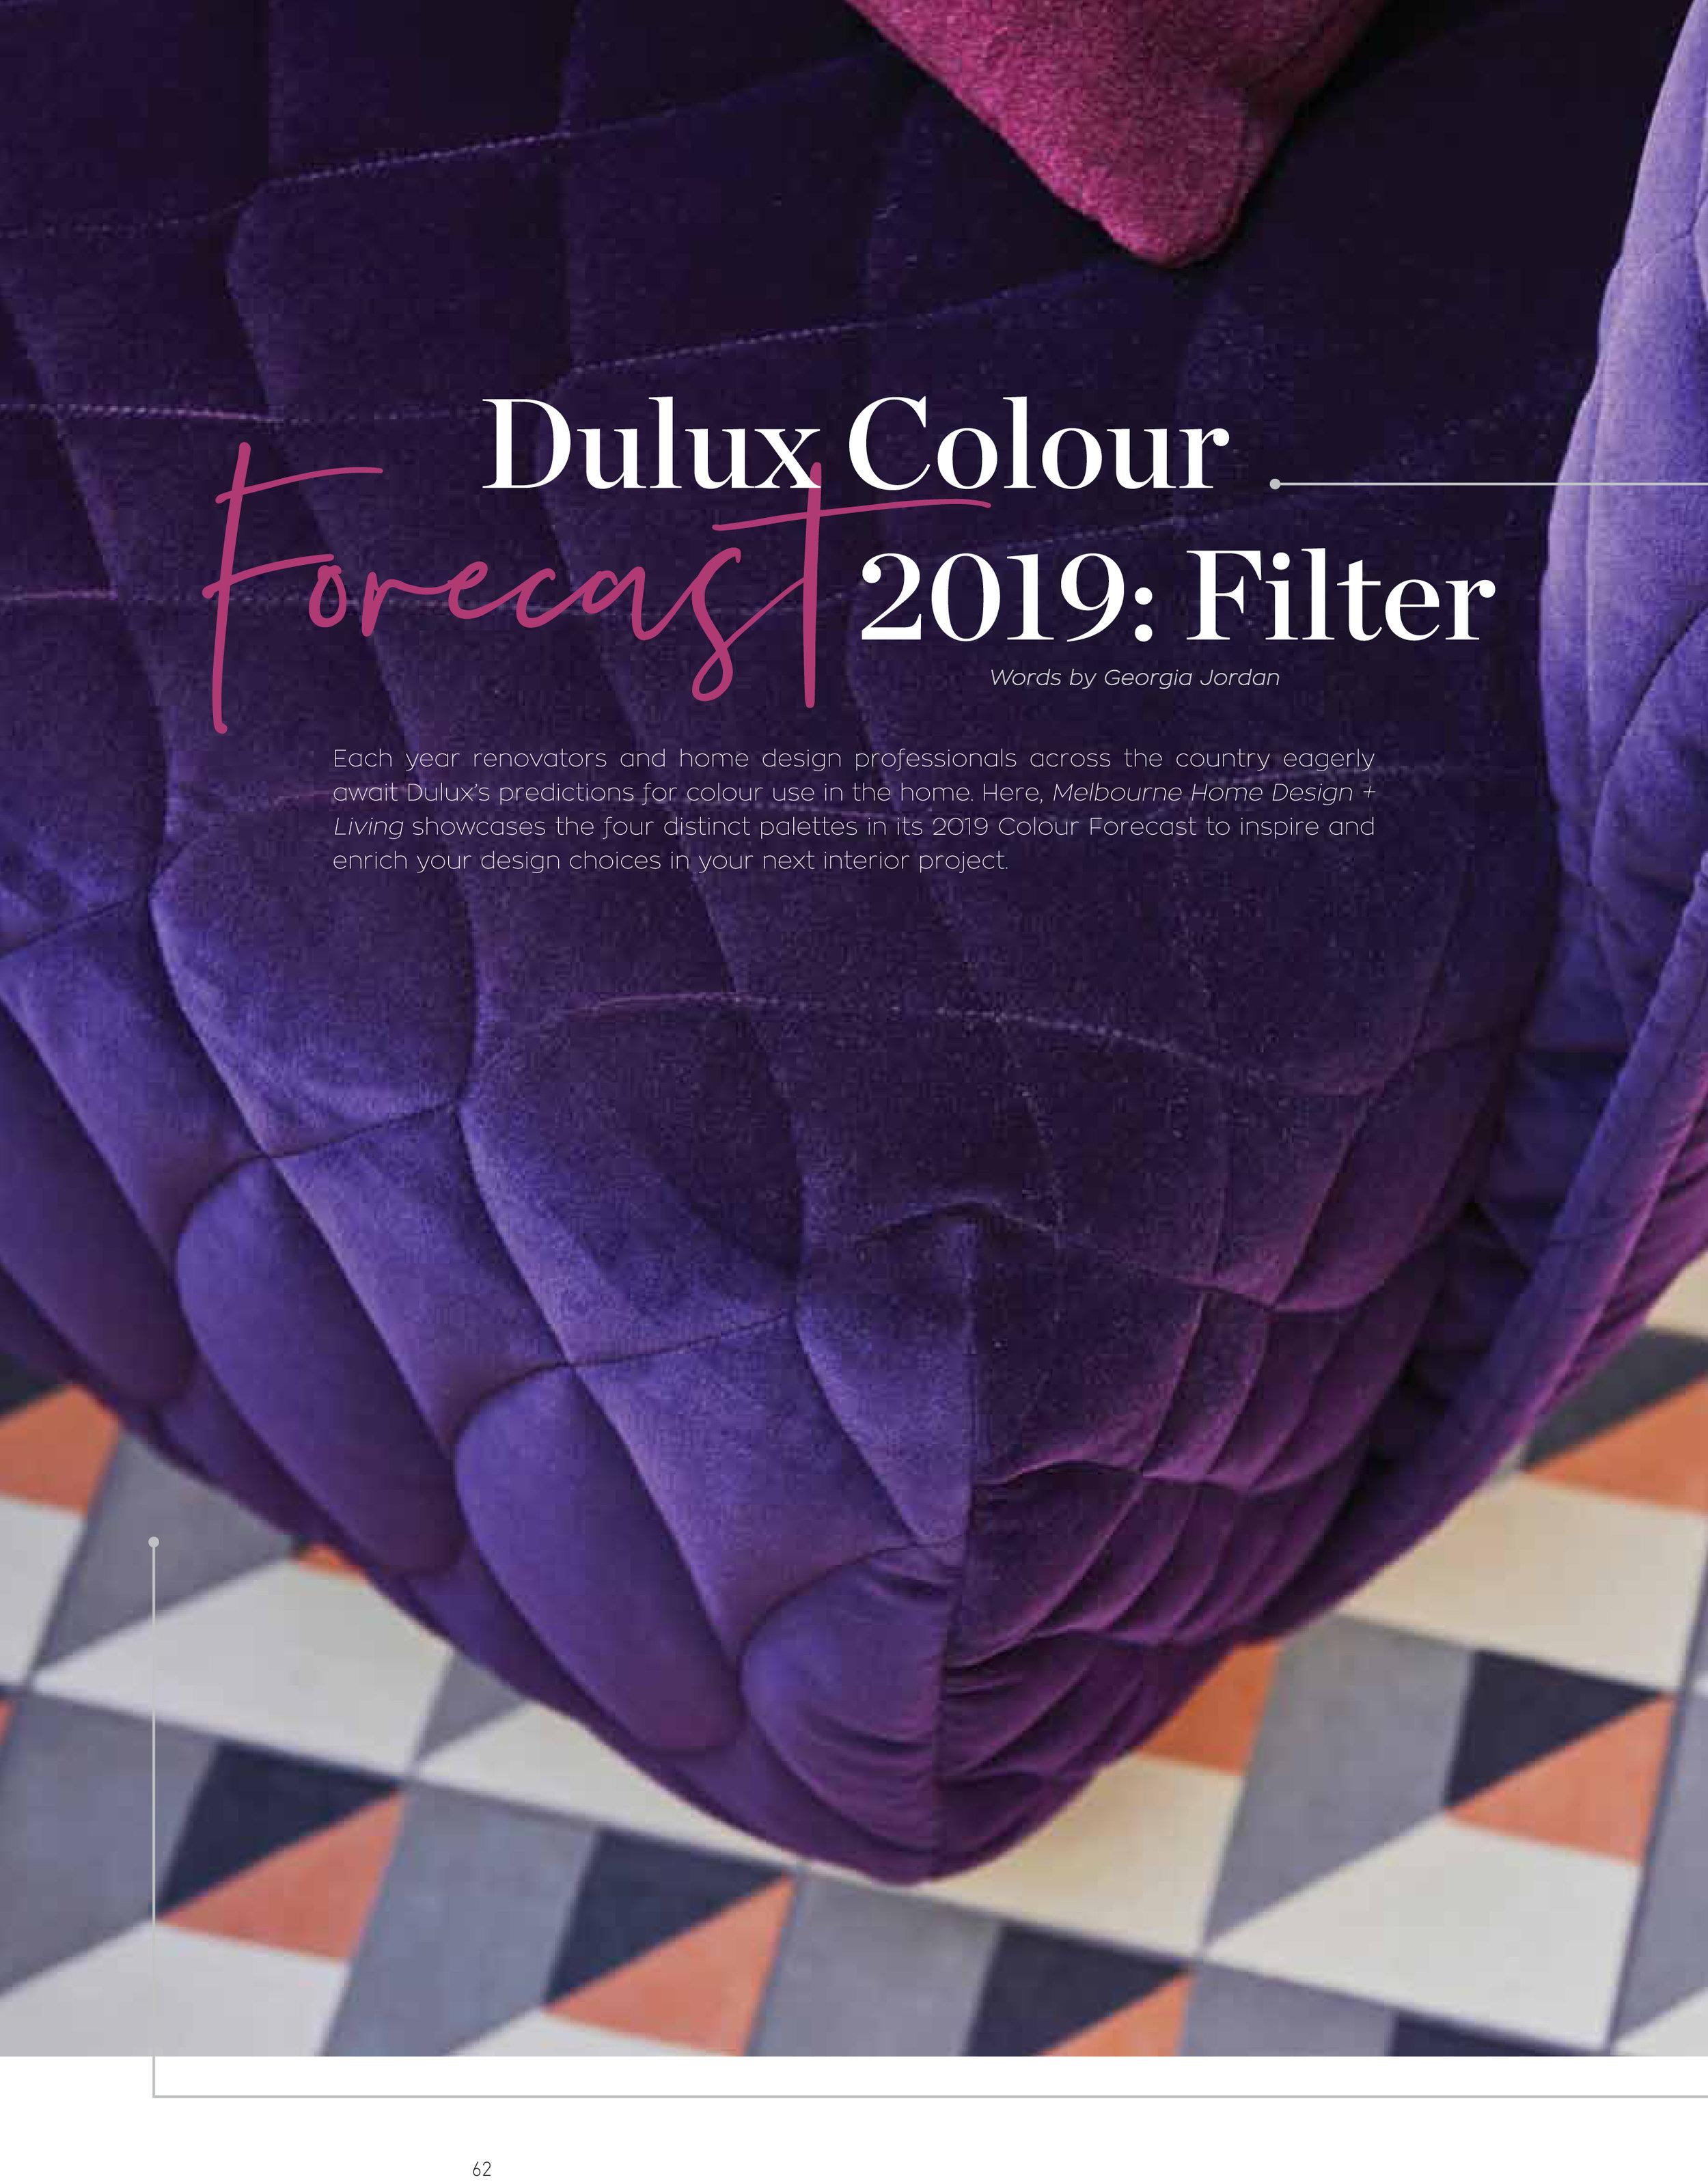 Dulux_Feat_MHDL26-1.jpg